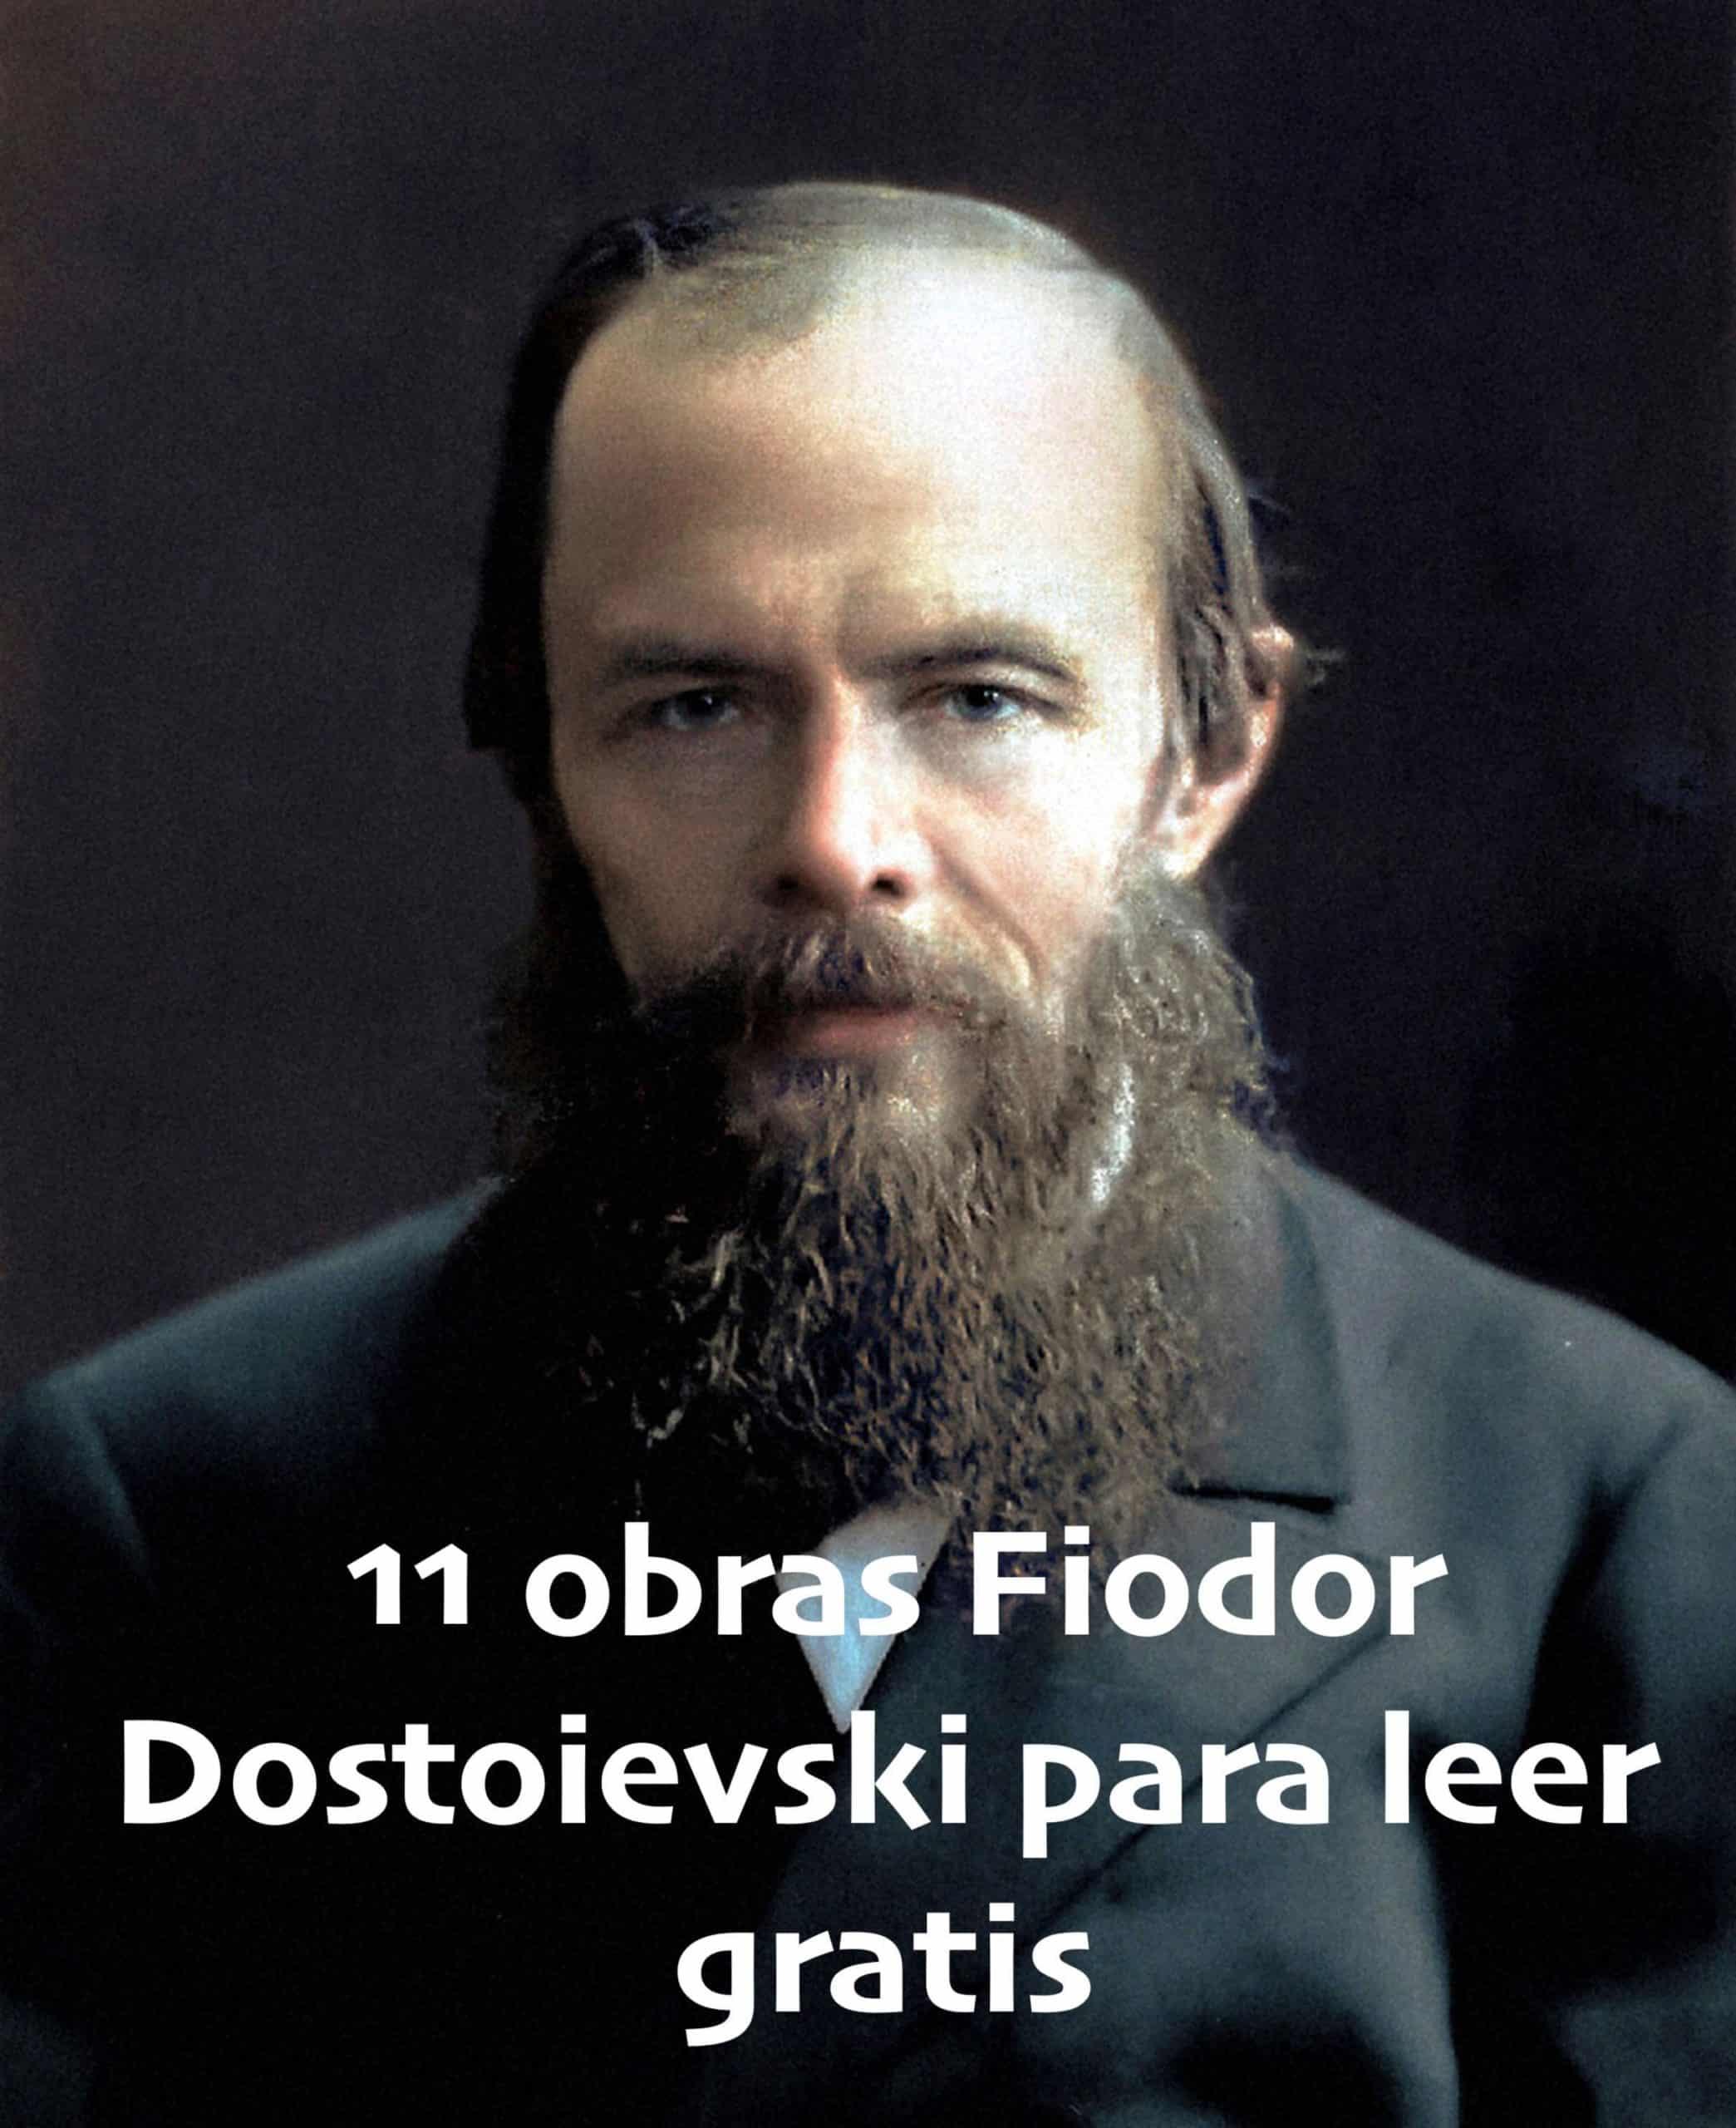 11 obras de Fiodor Dostoievski para leer gratis